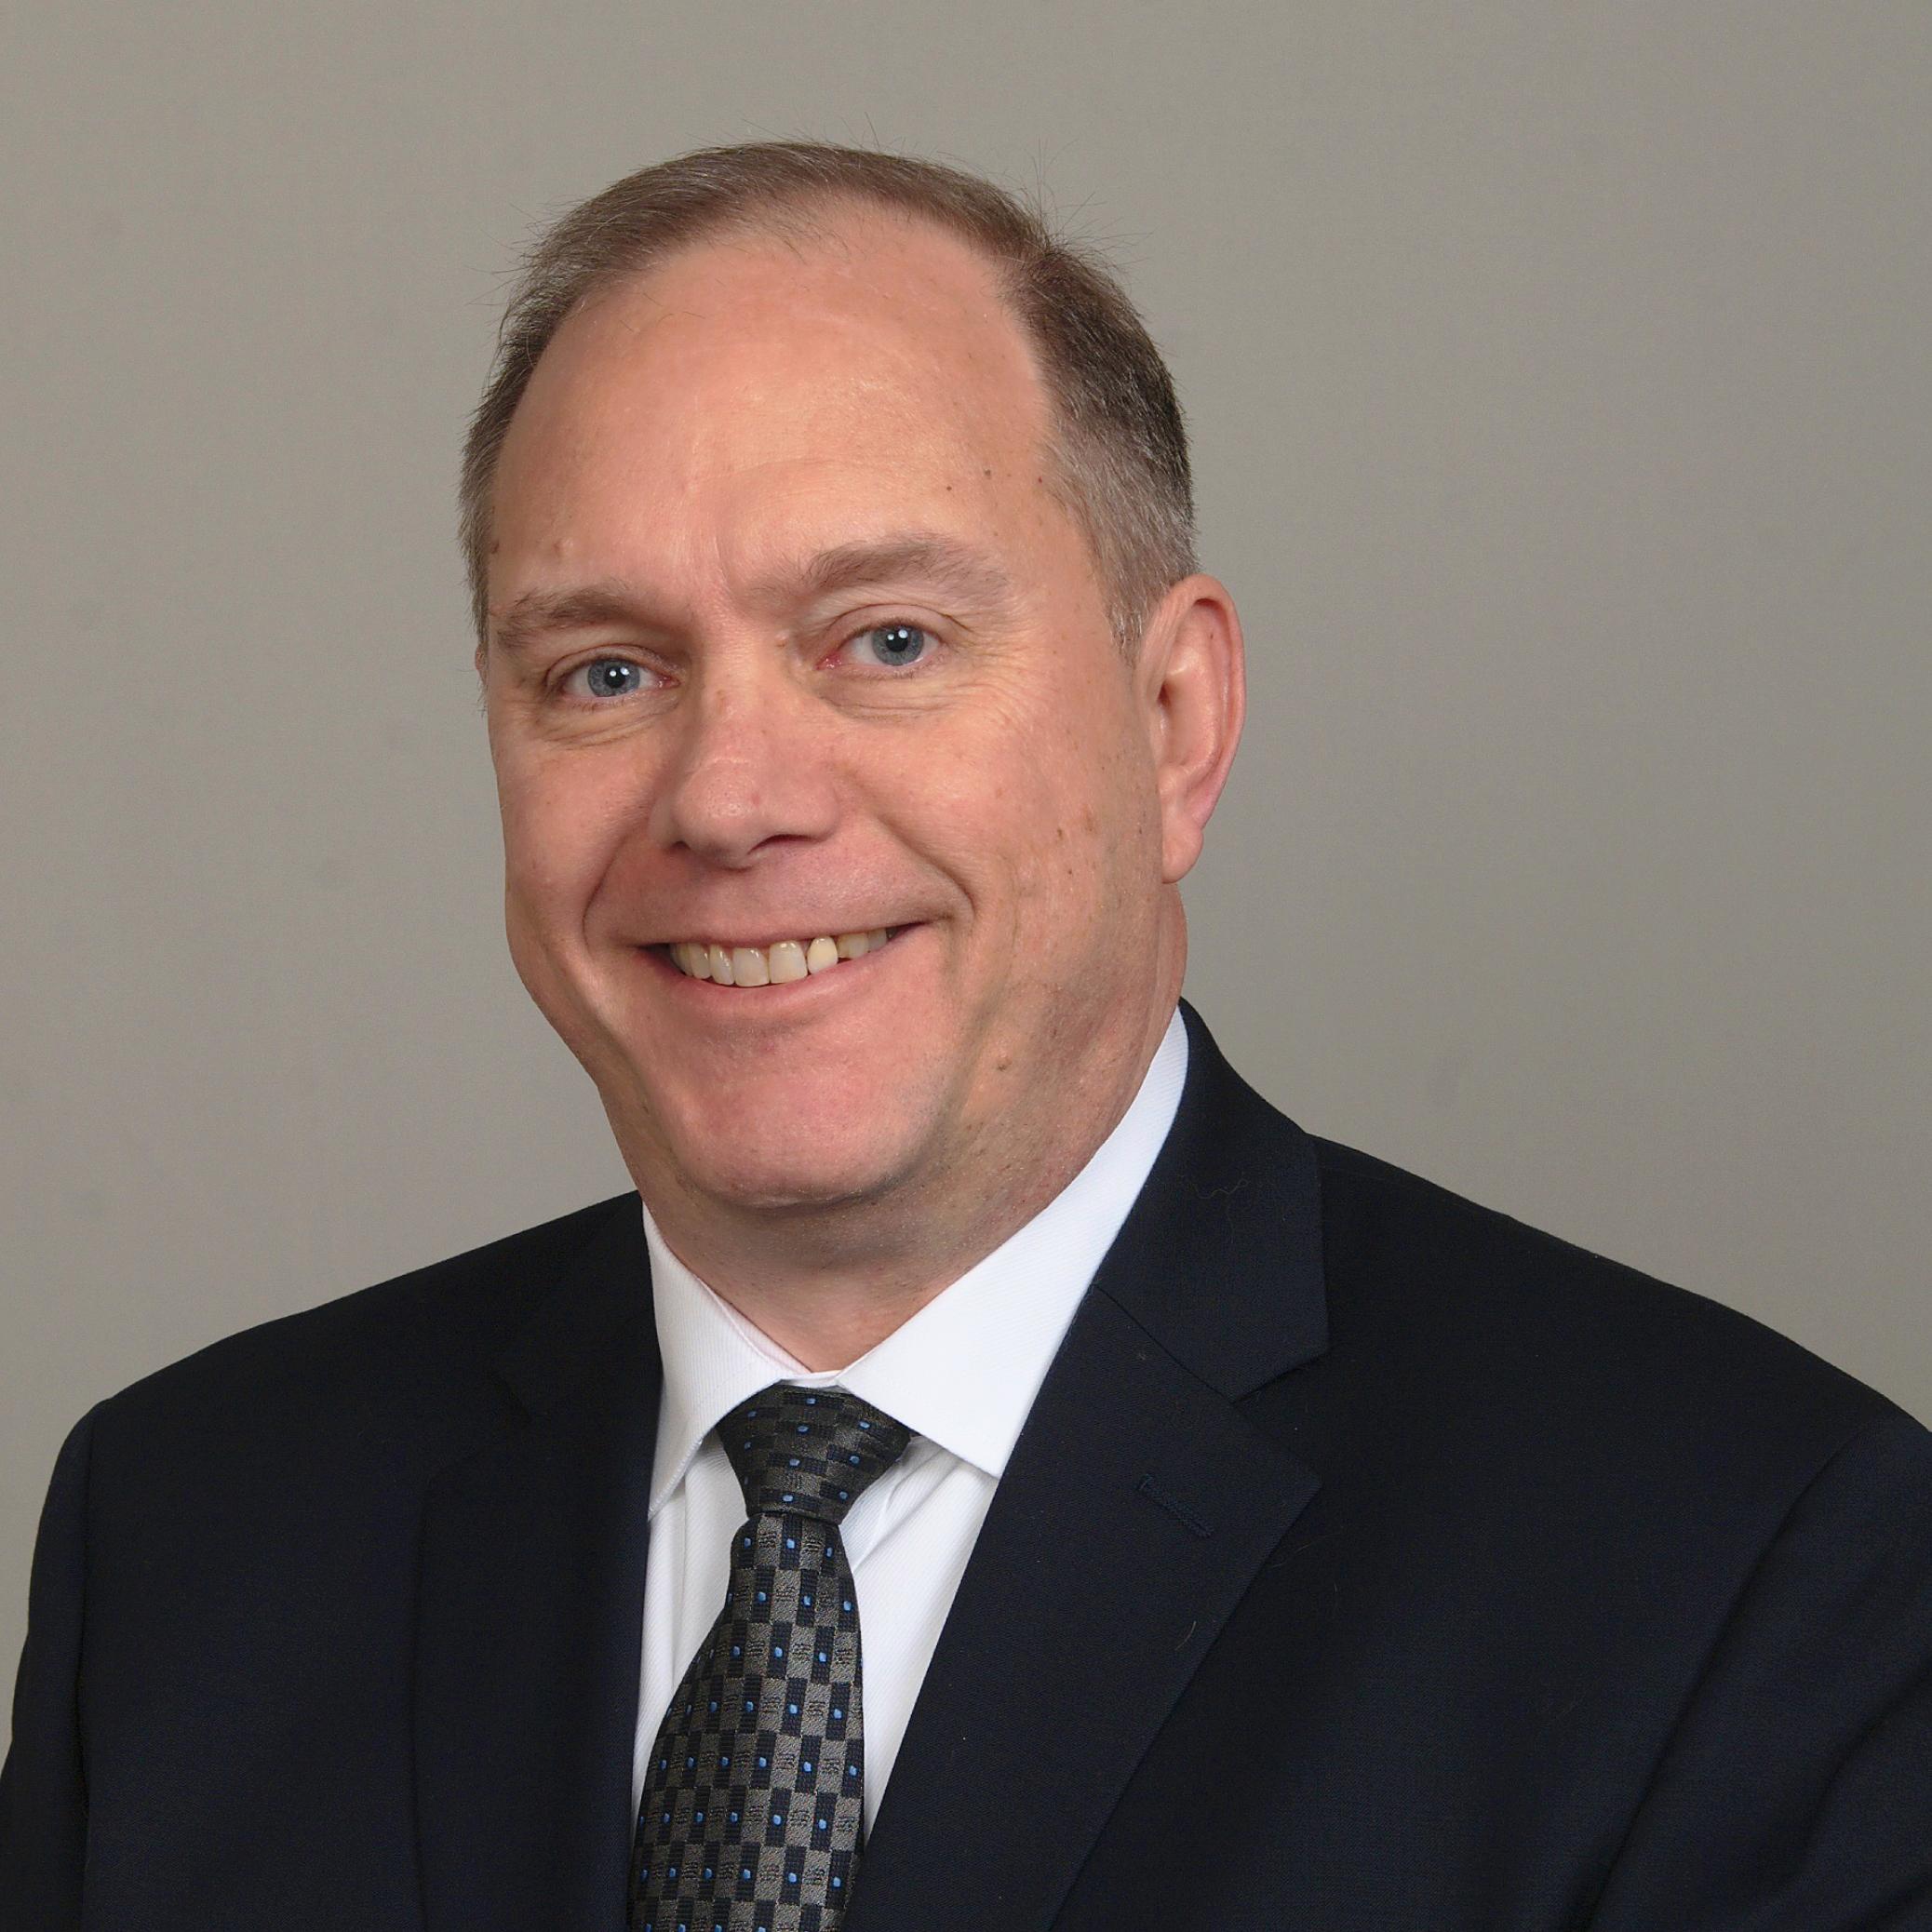 Greg Veldman